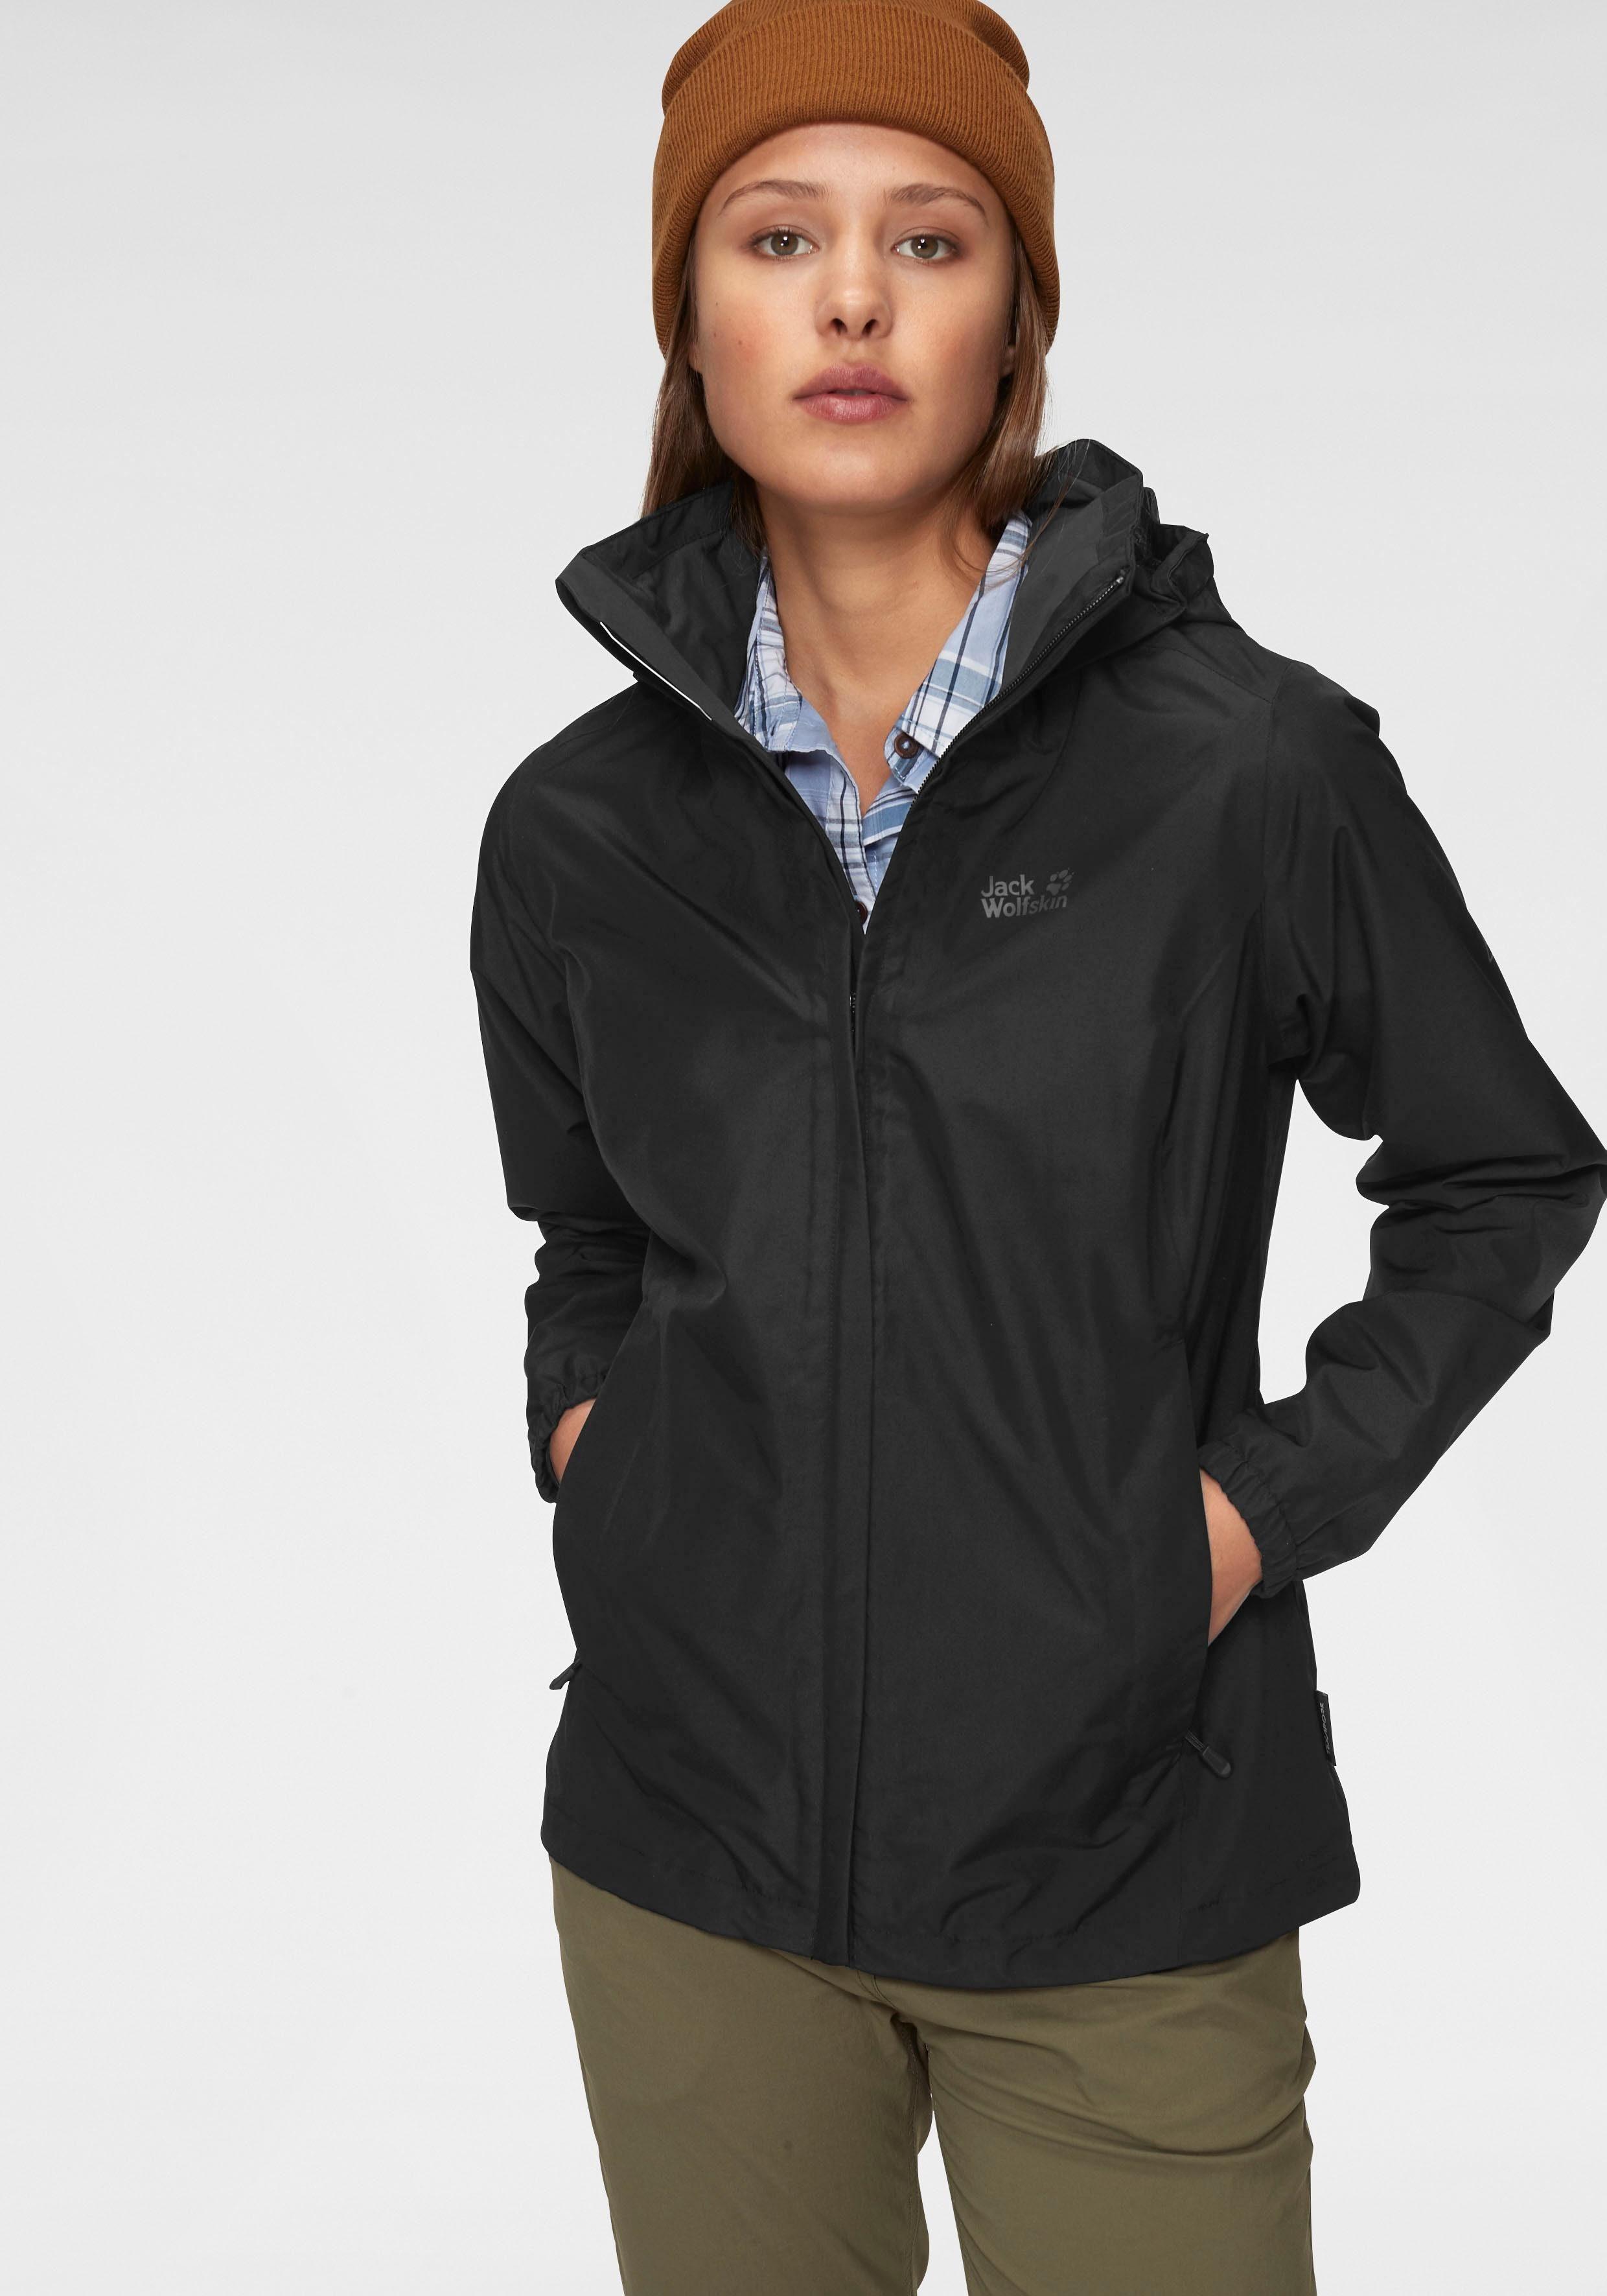 Jack Wolfskin Stormy Point Jacket Damen | Süd West